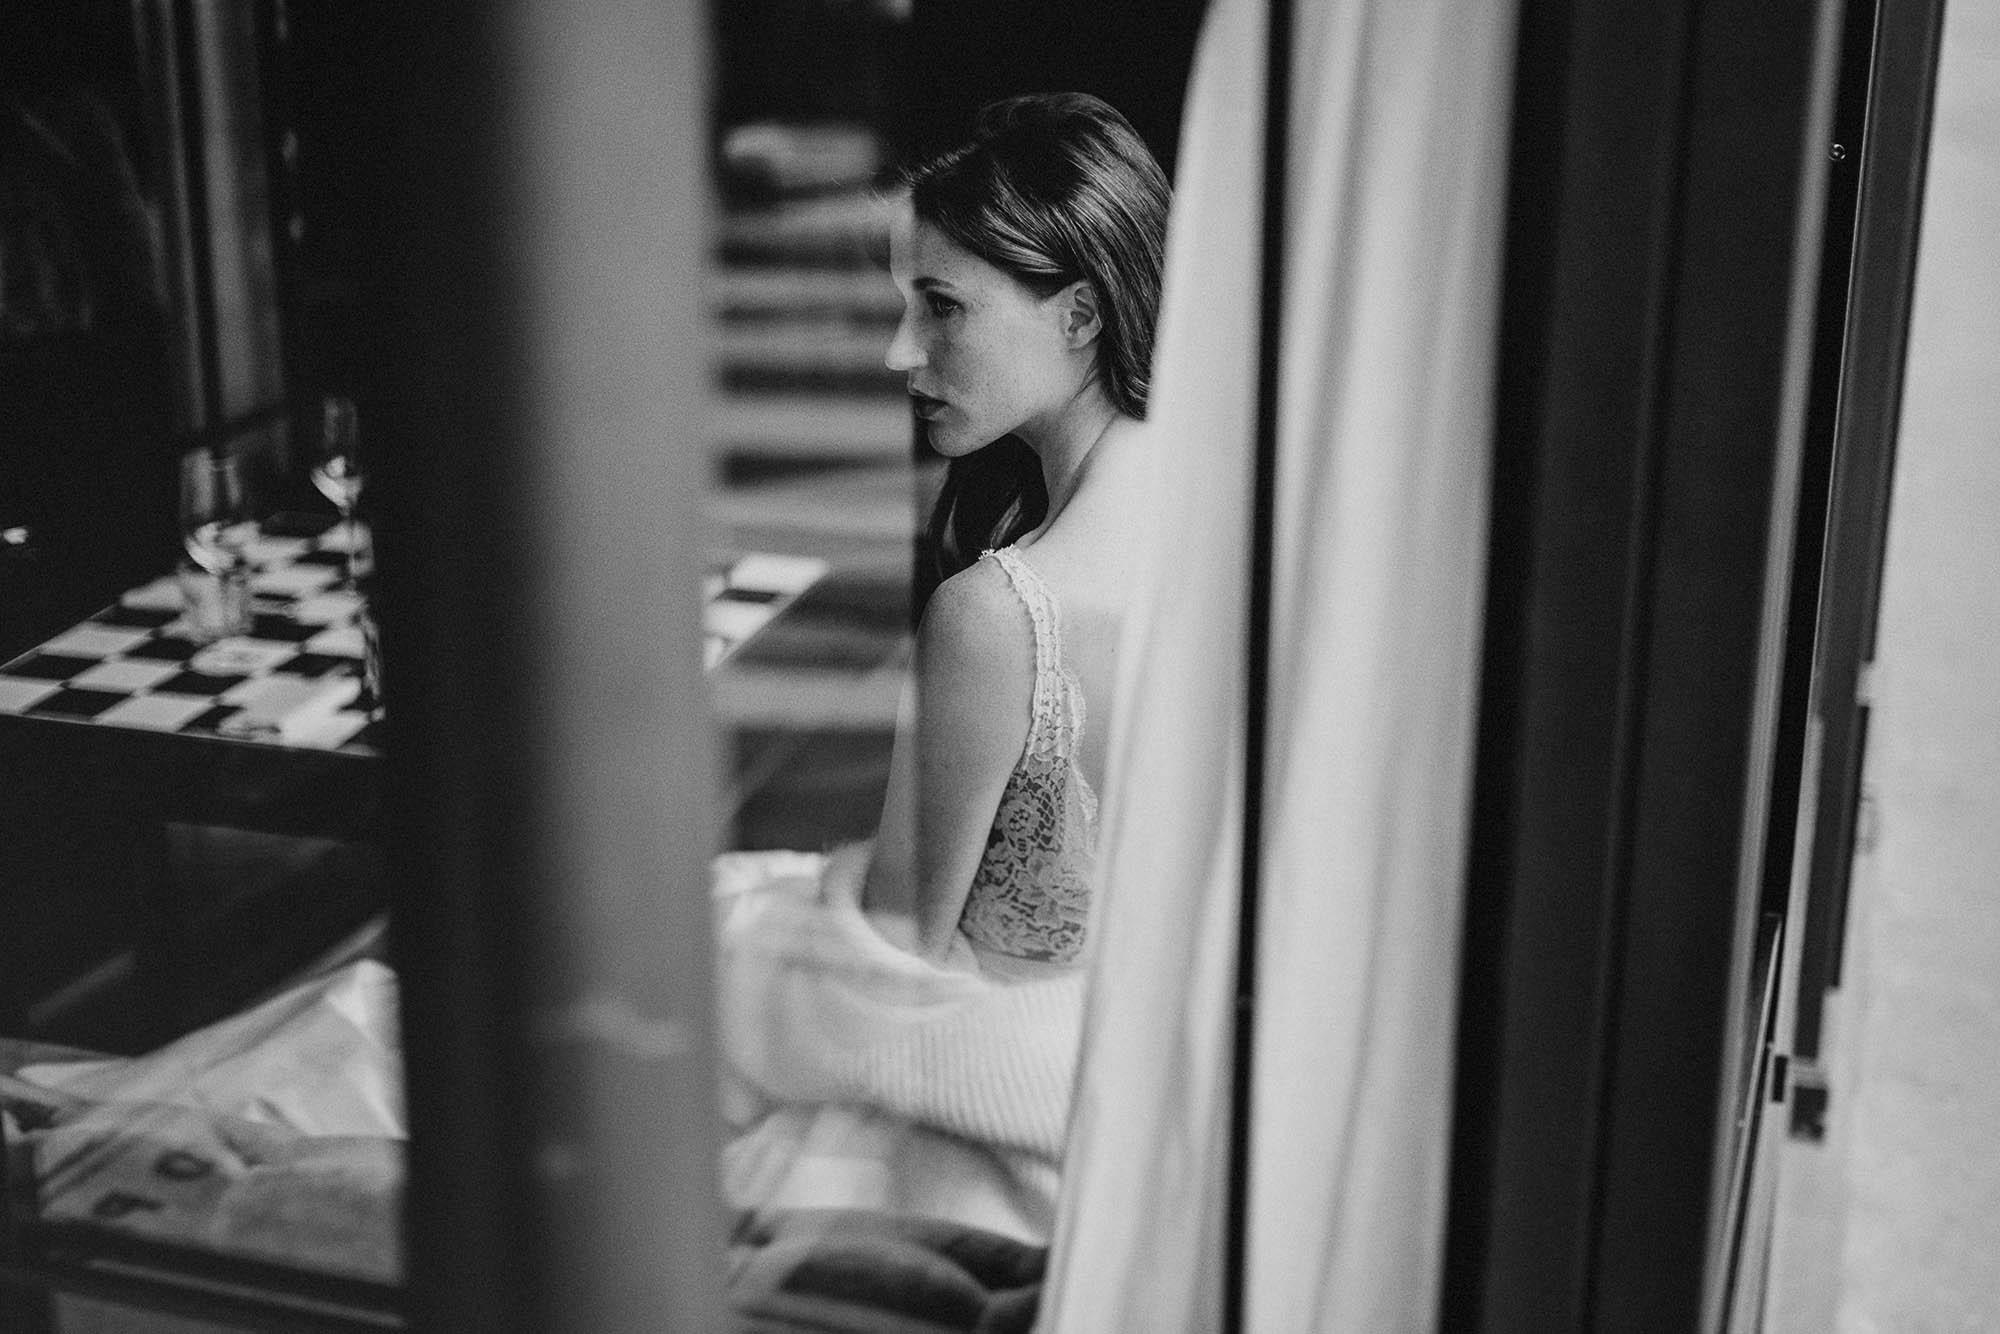 youmademydayphotography-destination-wedding-photographer-david-purves-boheme-rock-paris-web-80